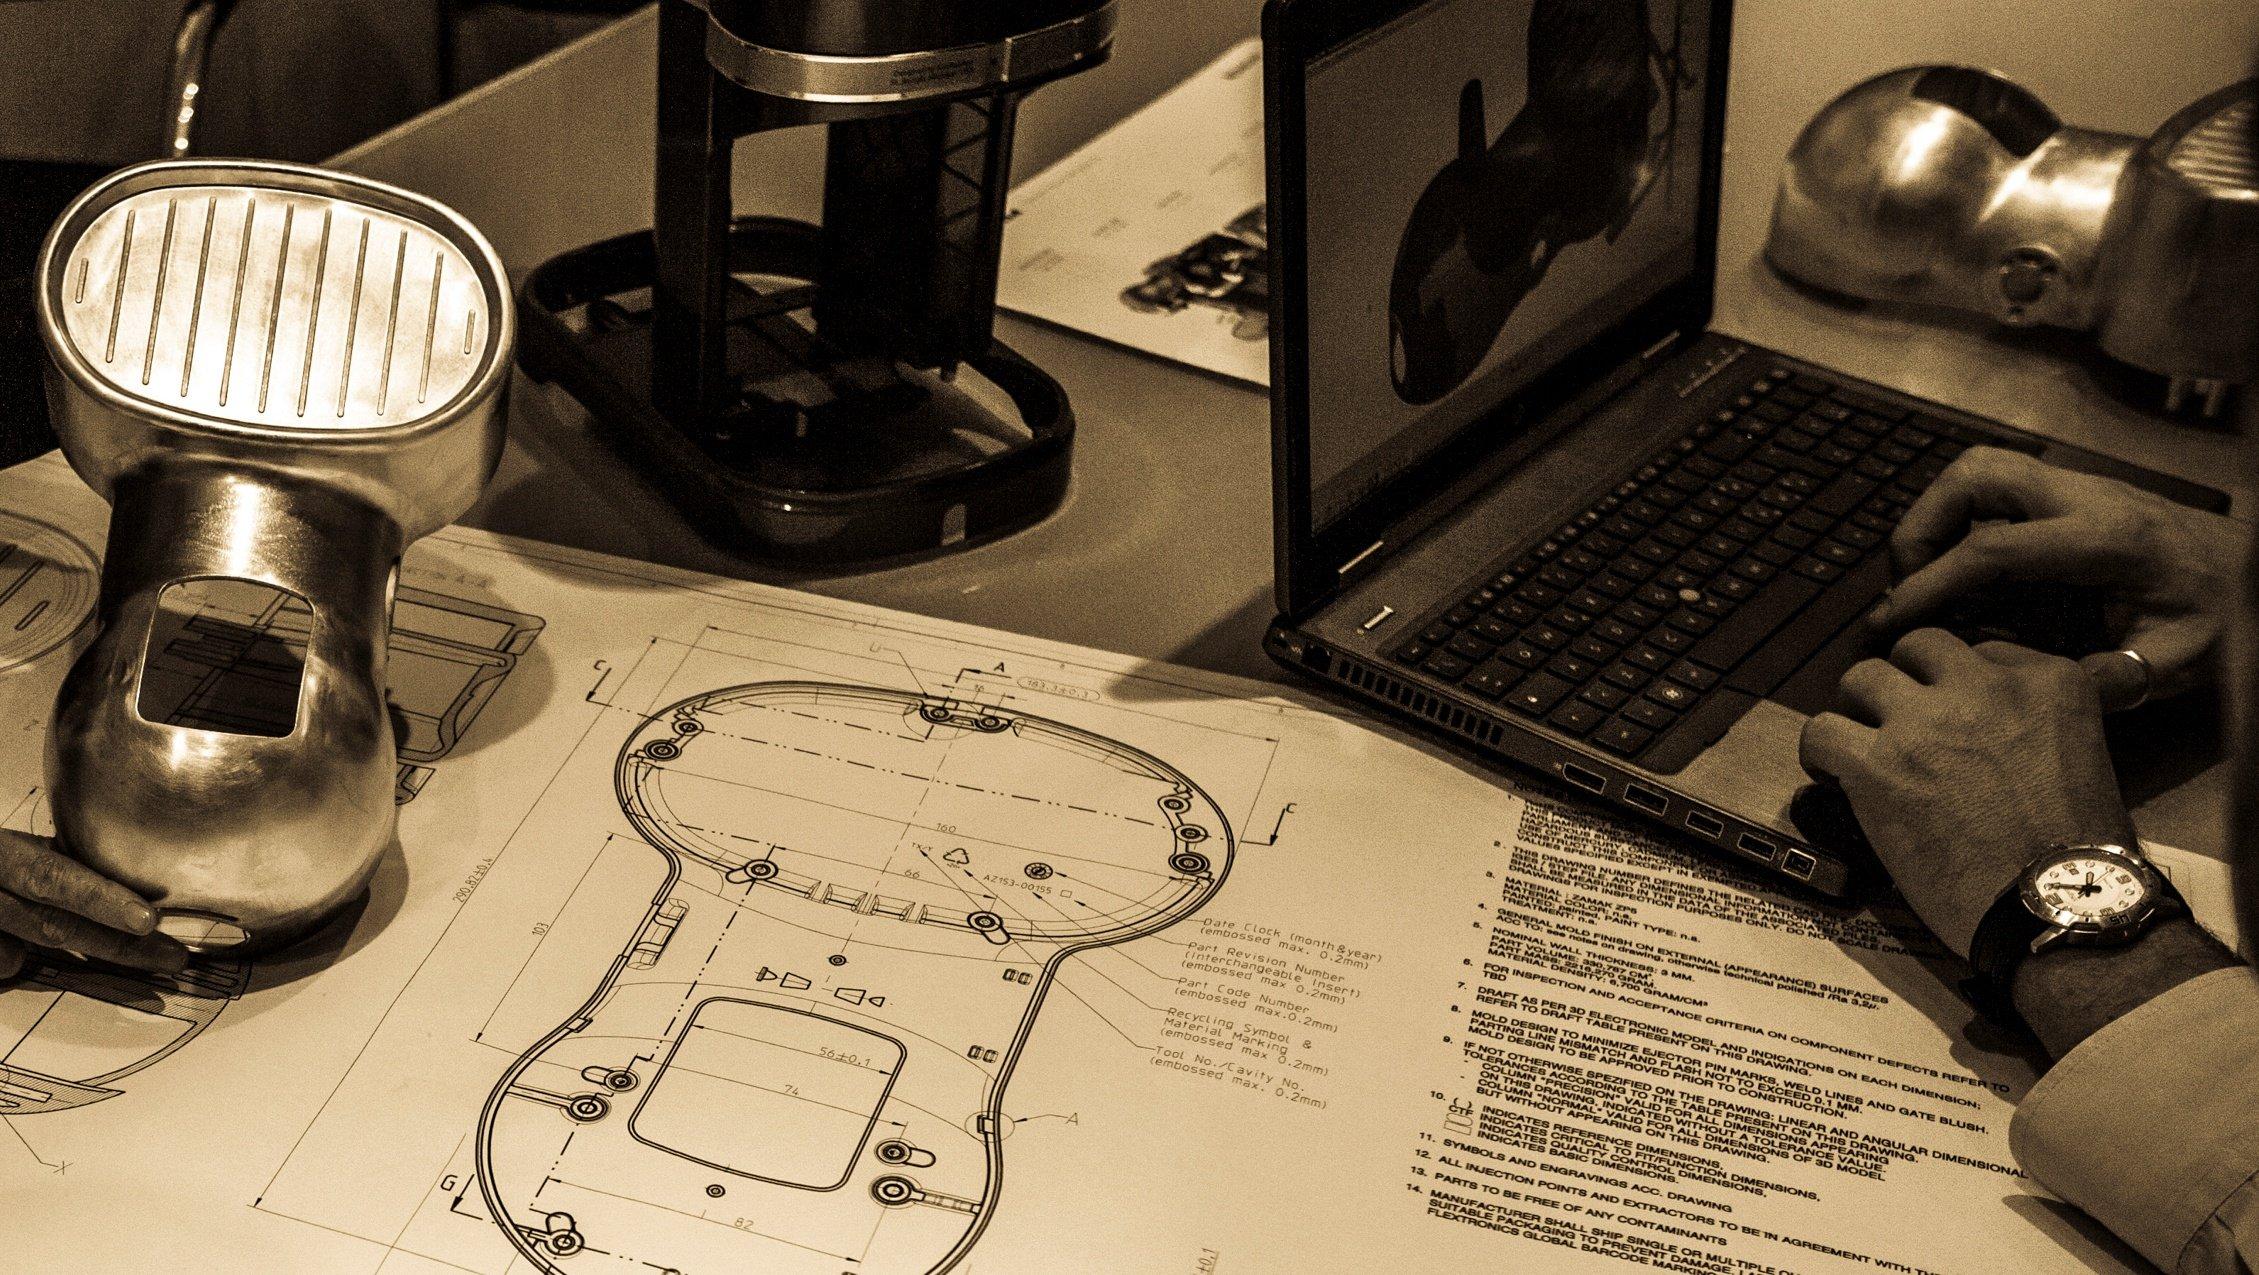 Co design zinc die casting Bruschi